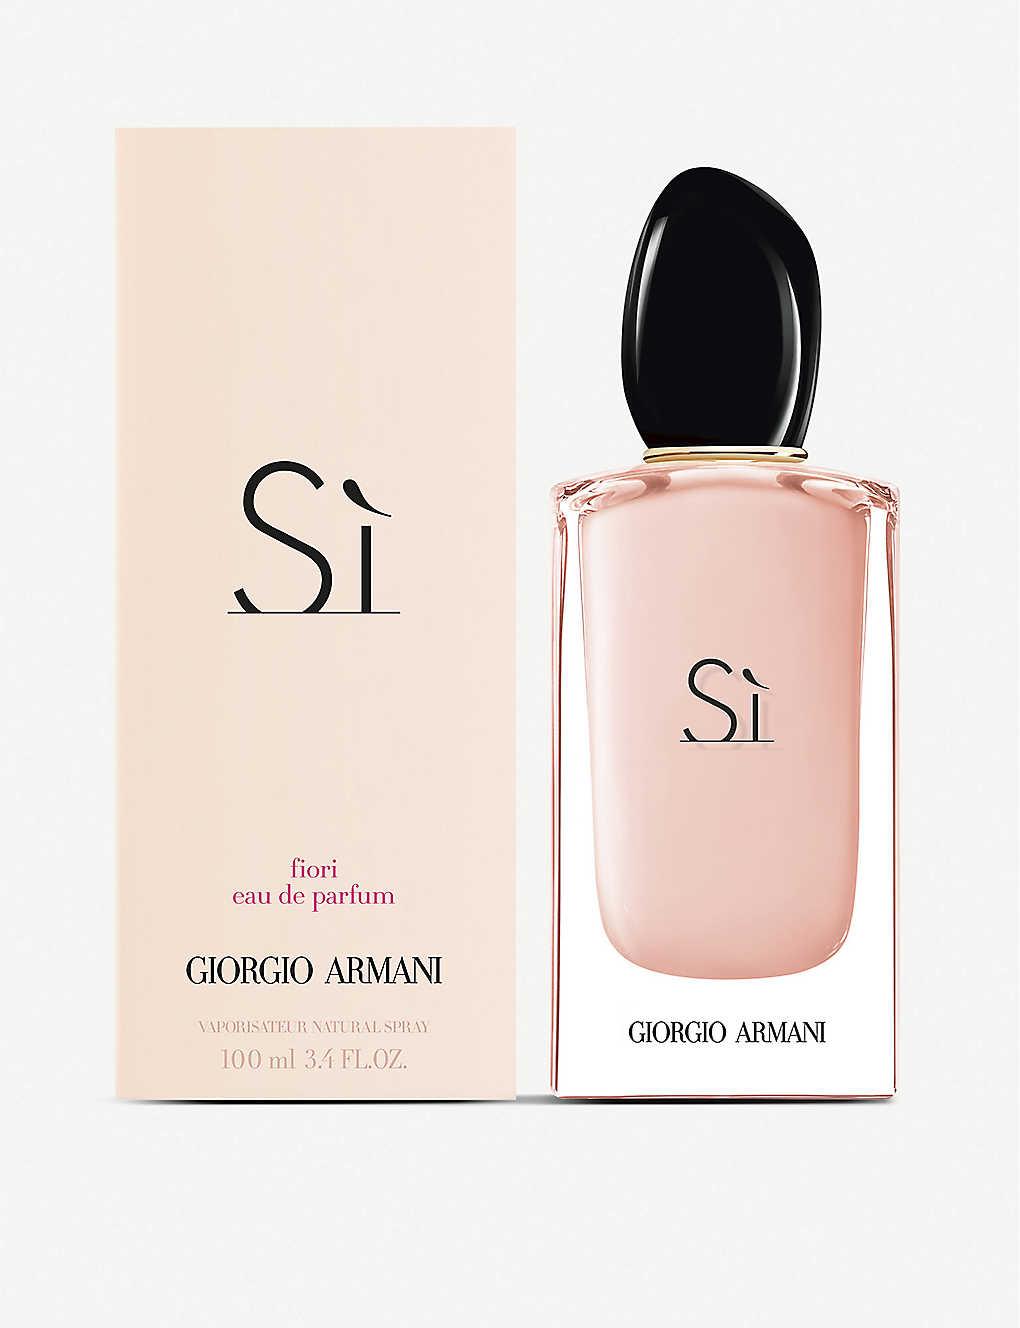 GIORGIO ARMANI: Si Fiori eau de parfum, 100ml